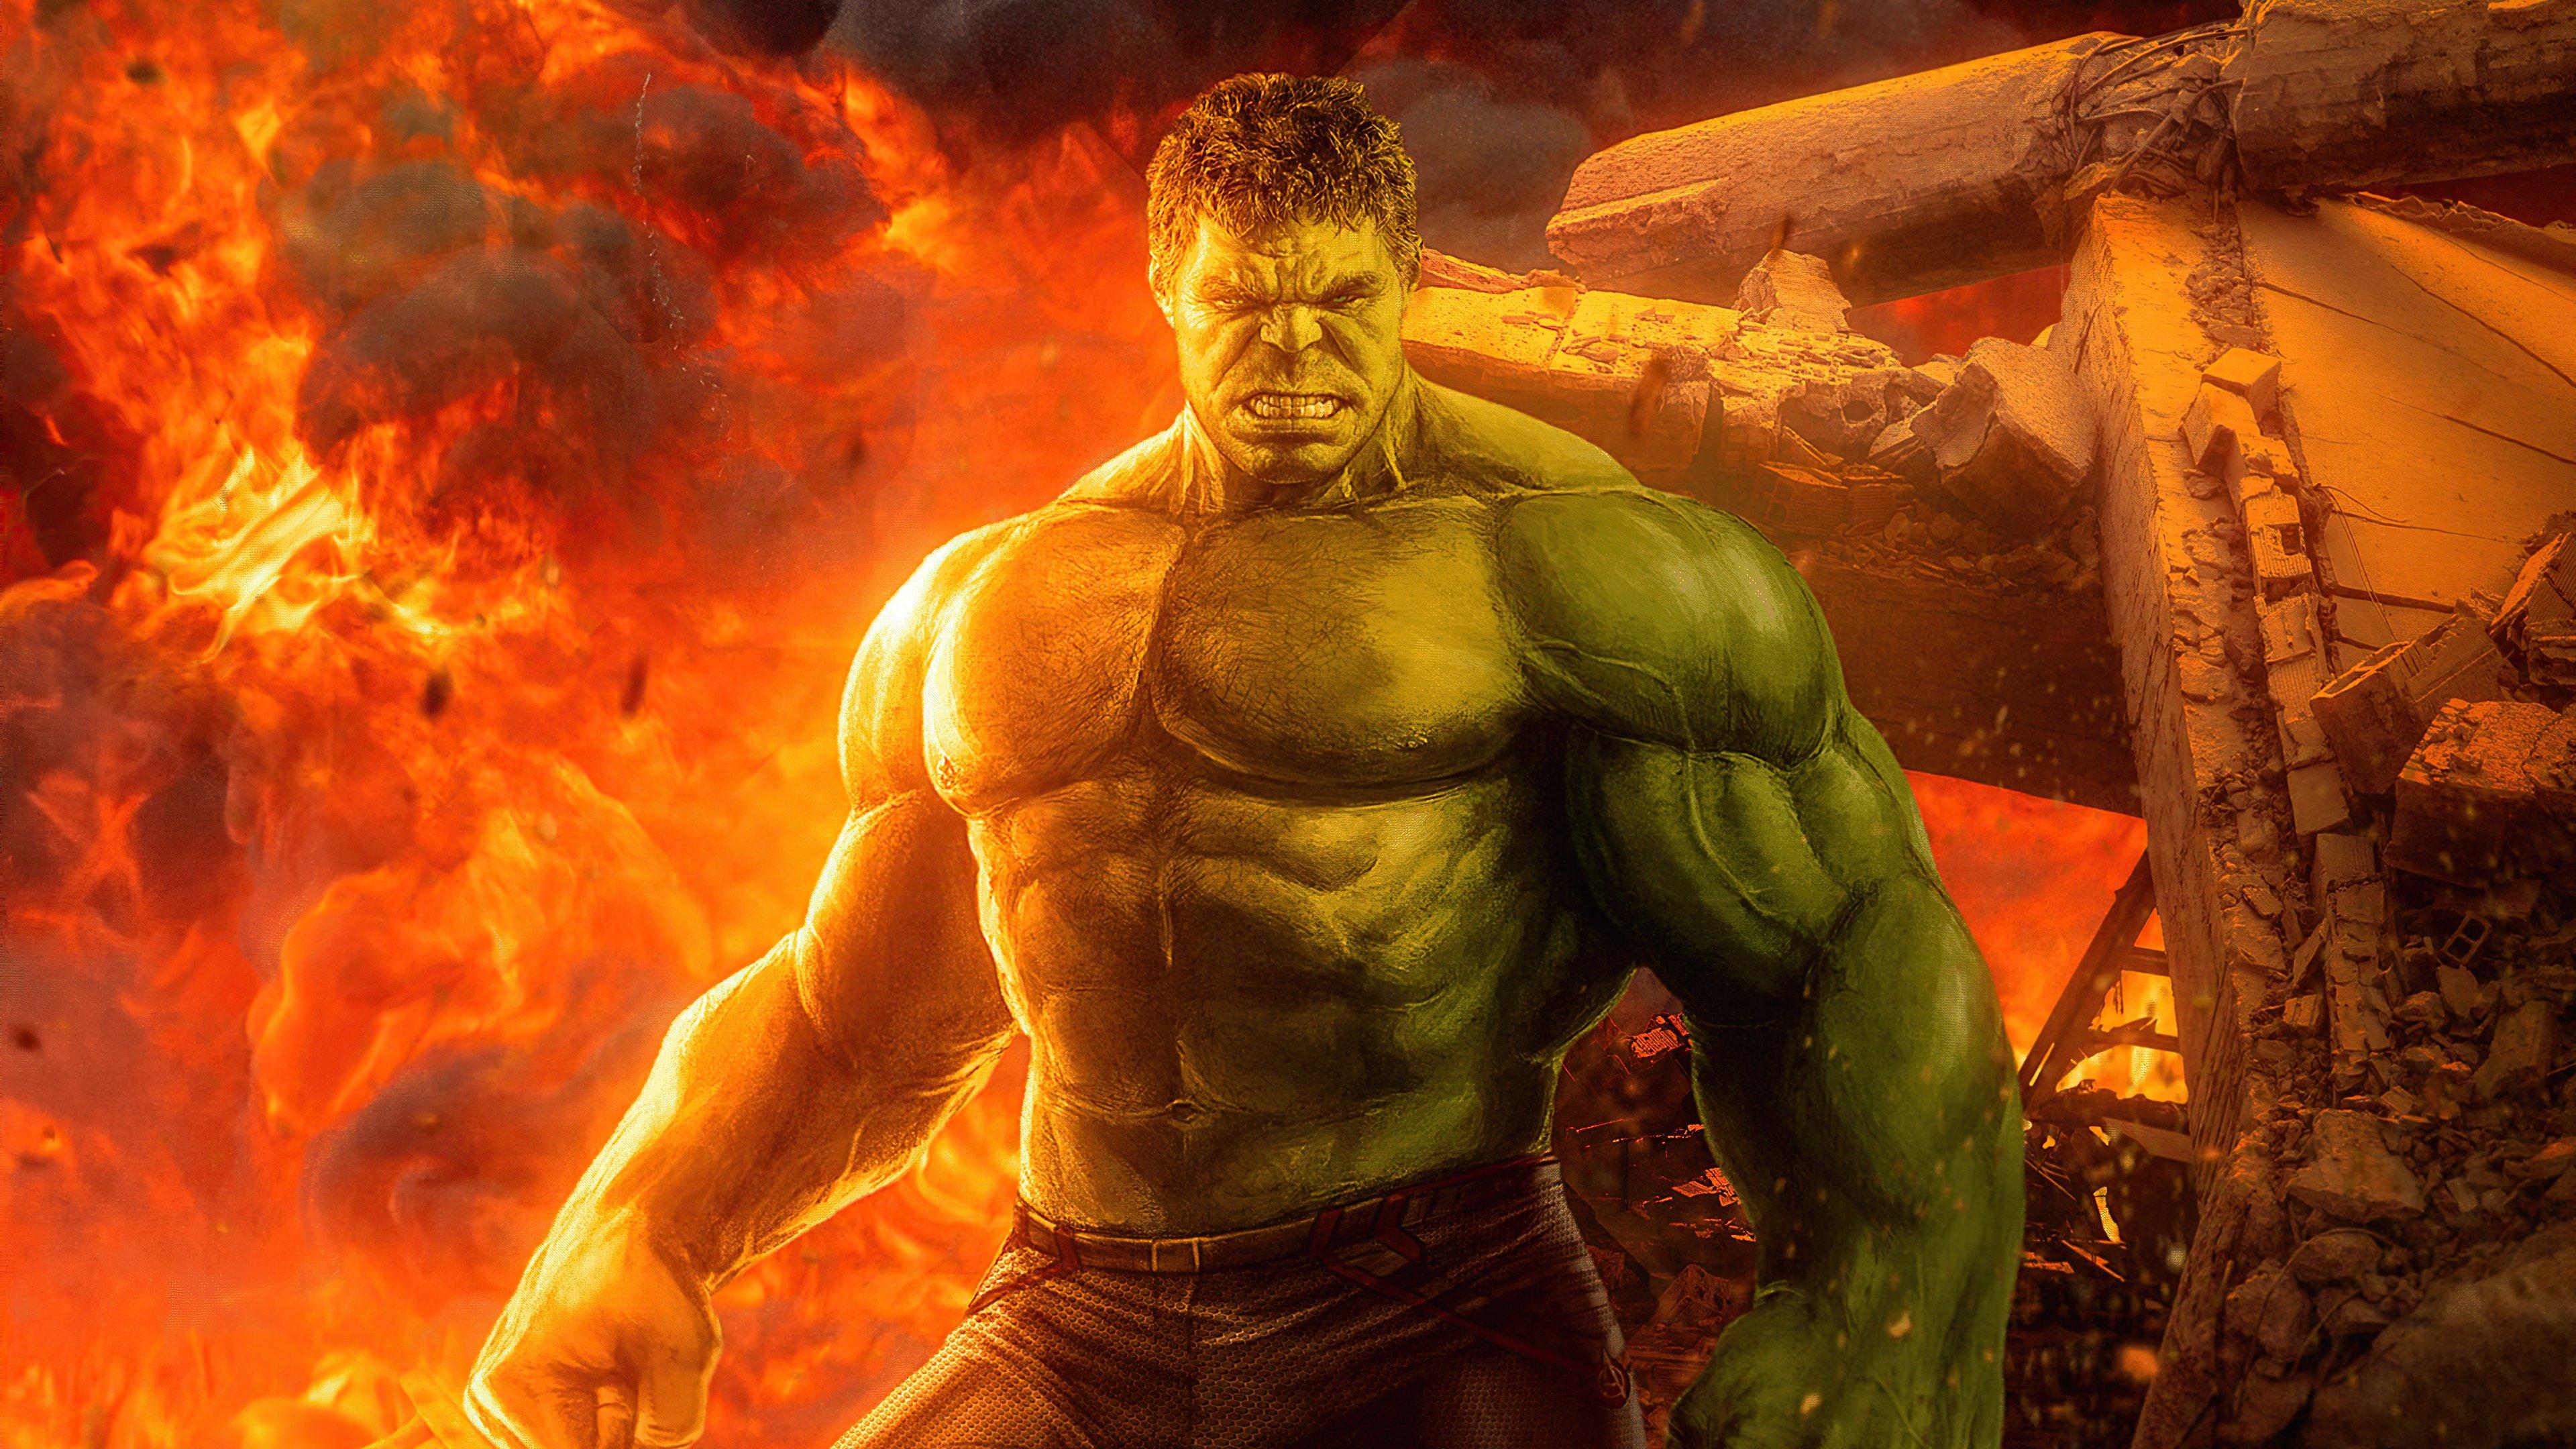 Wallpaper Hulk 2020 Artwork